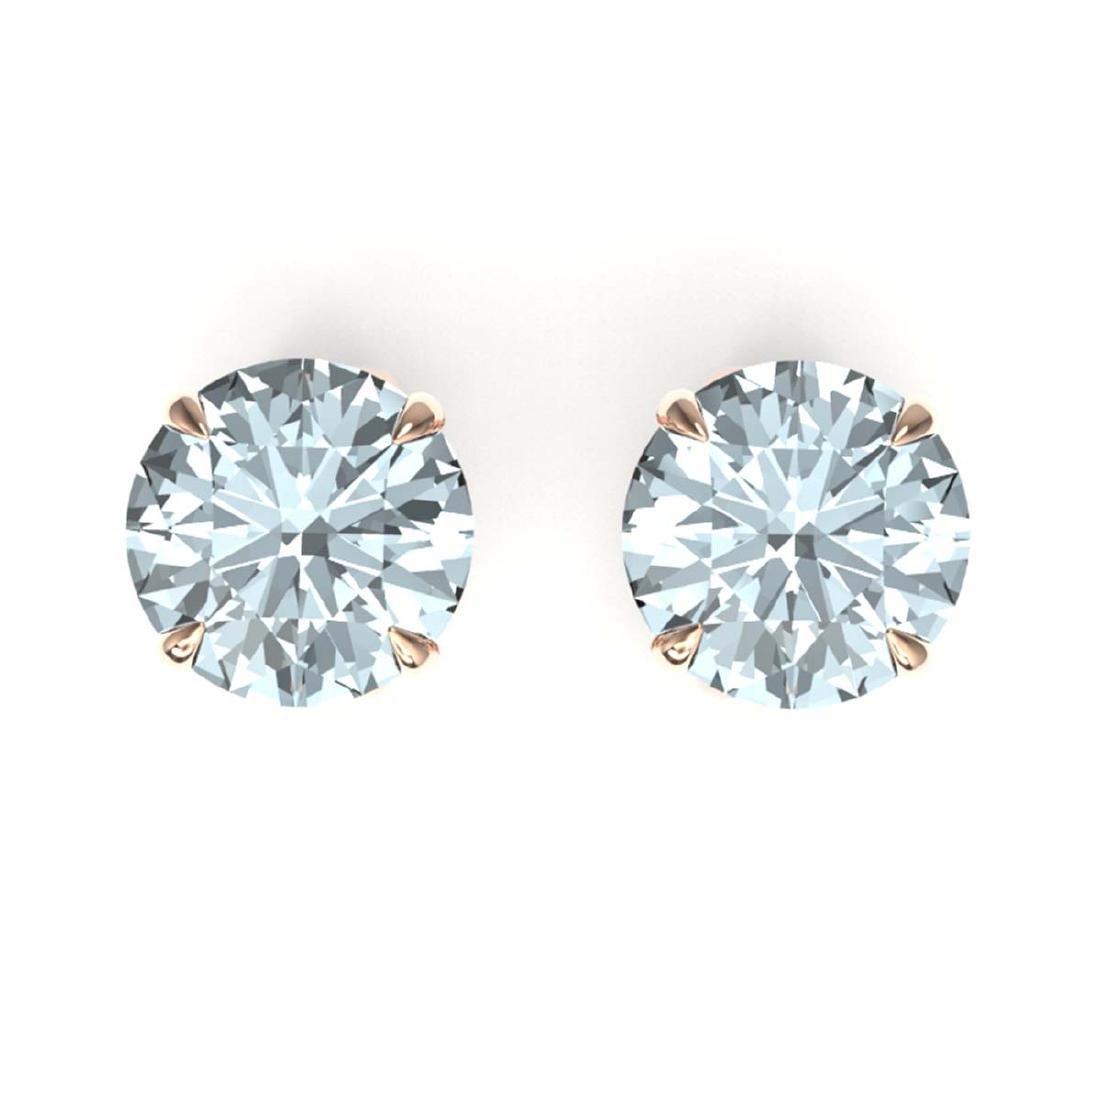 4 CTW Genuine Sky Blue Topaz Stud Earrings 14K Rose